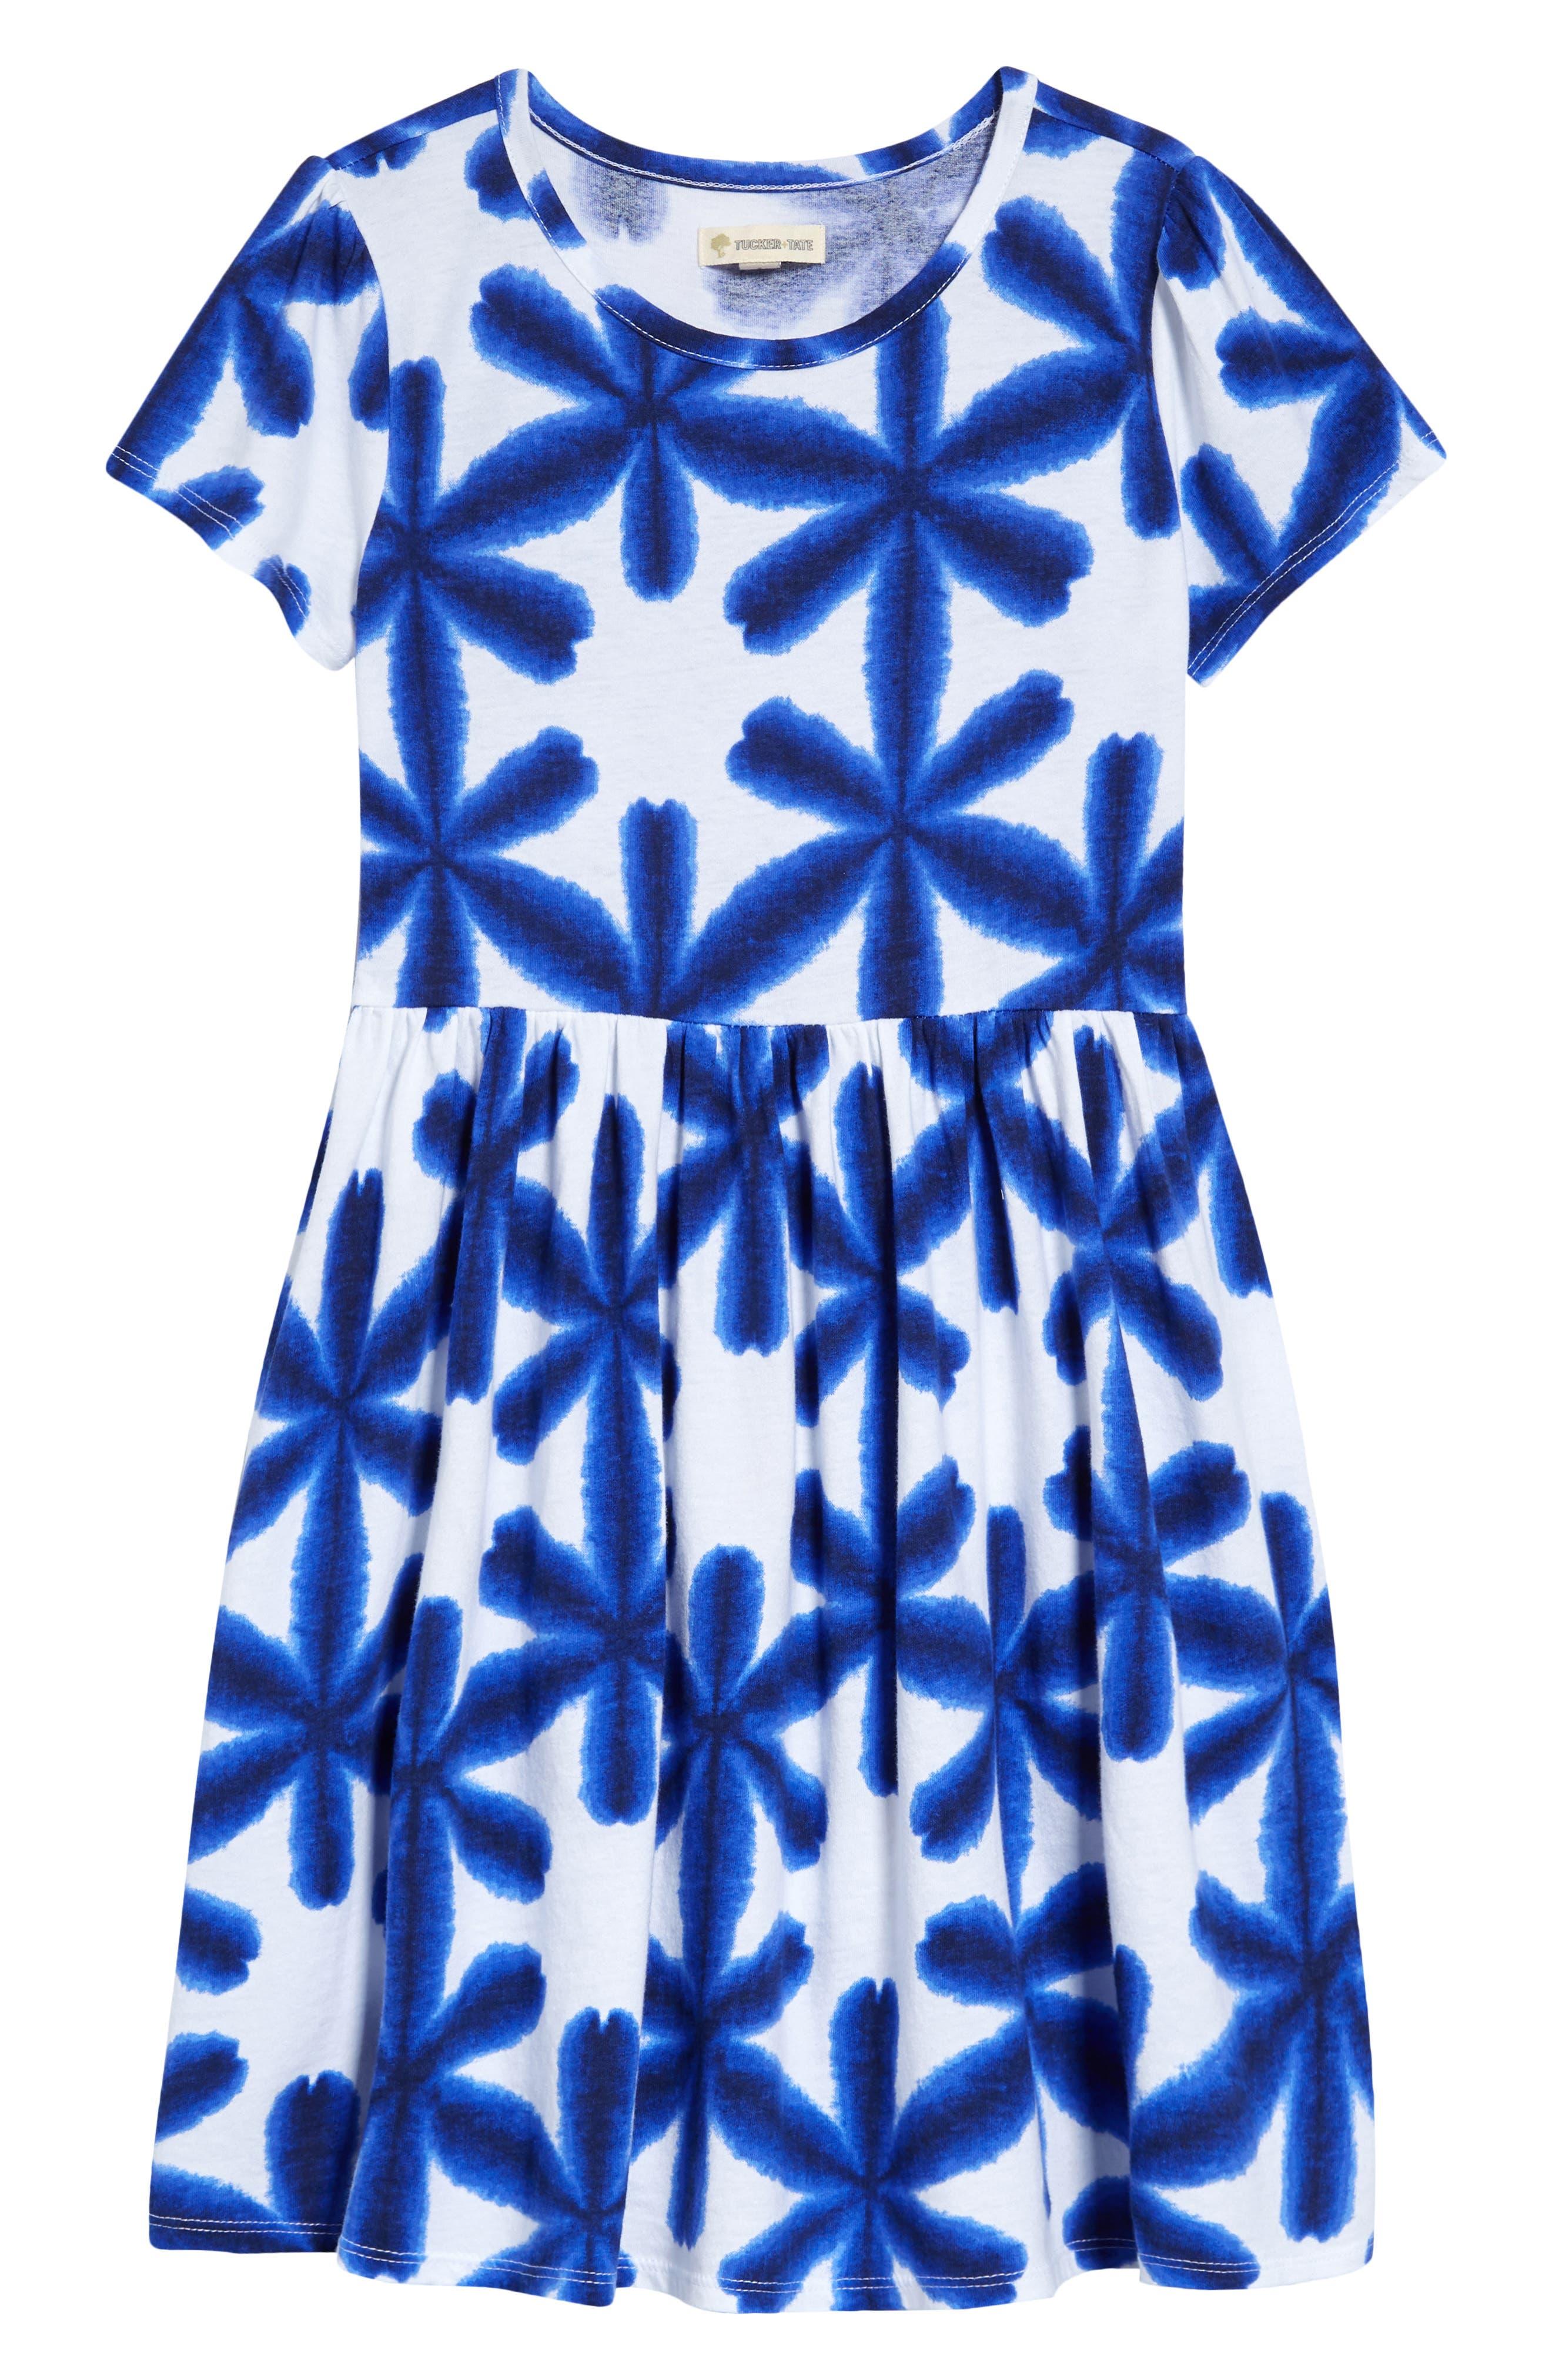 Tucker + Tate Cottons PRINTED SHORT SLEEVE DRESS